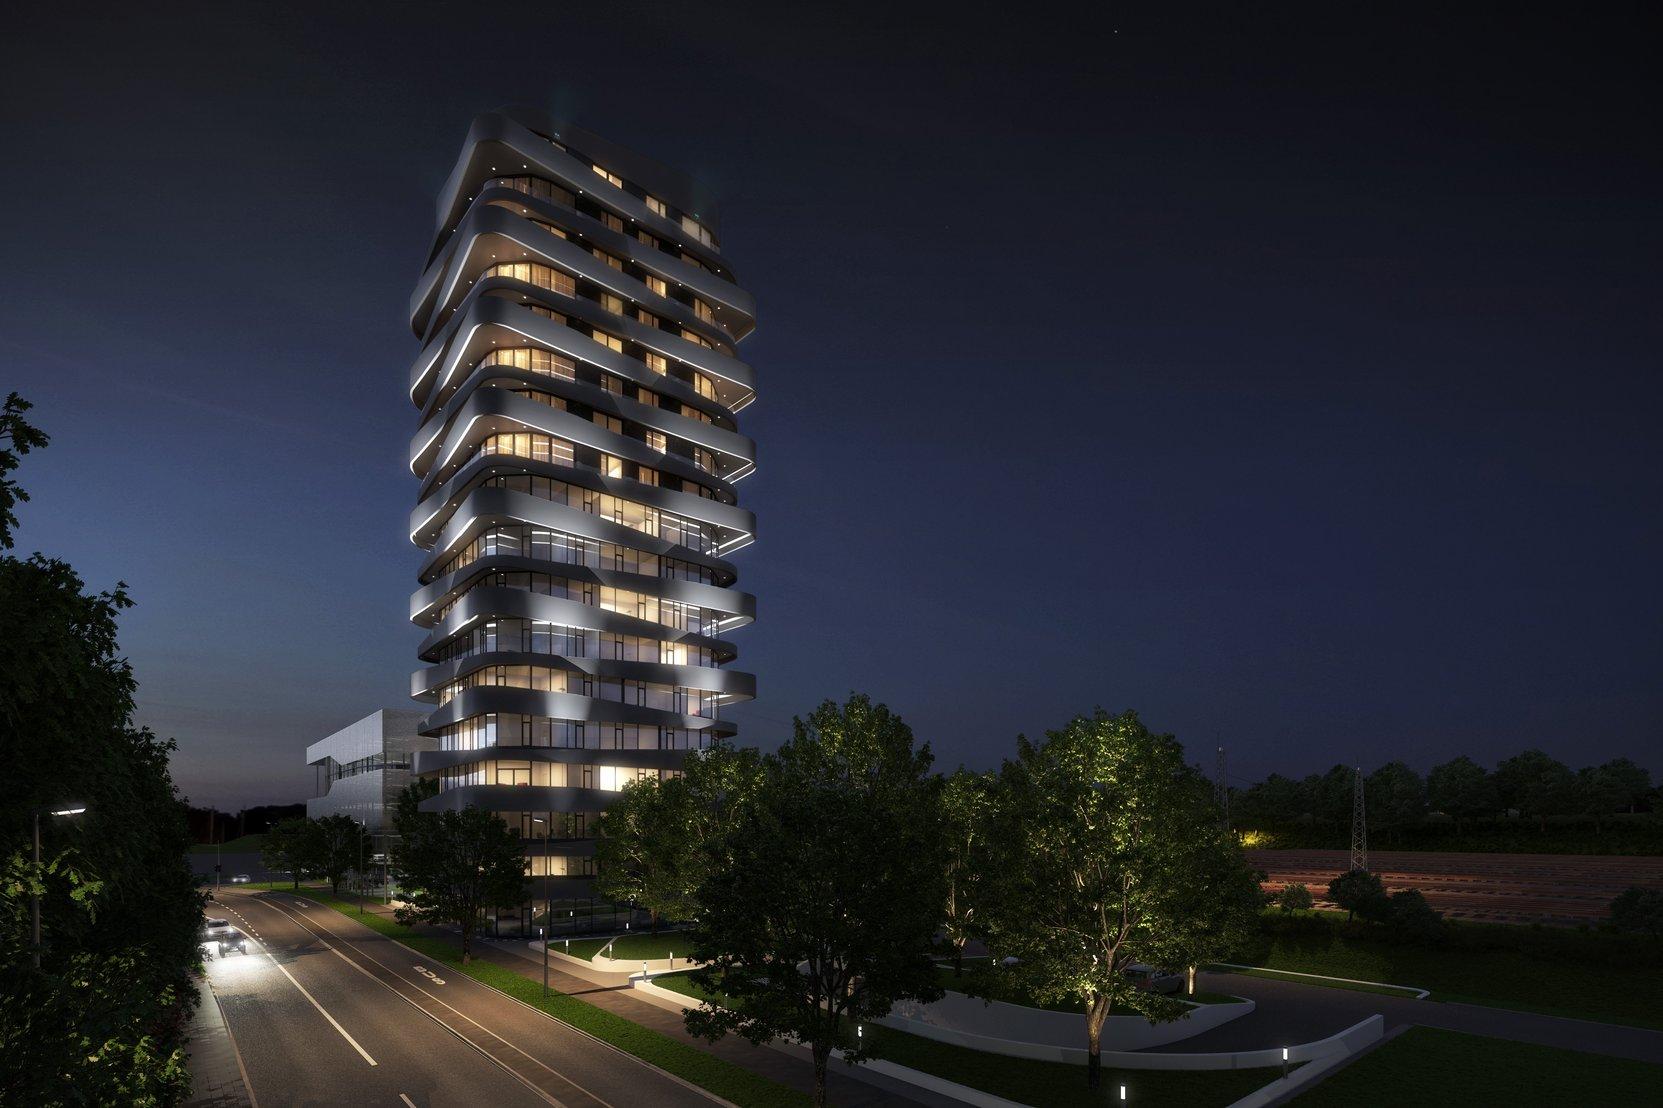 SKY-Tower at night